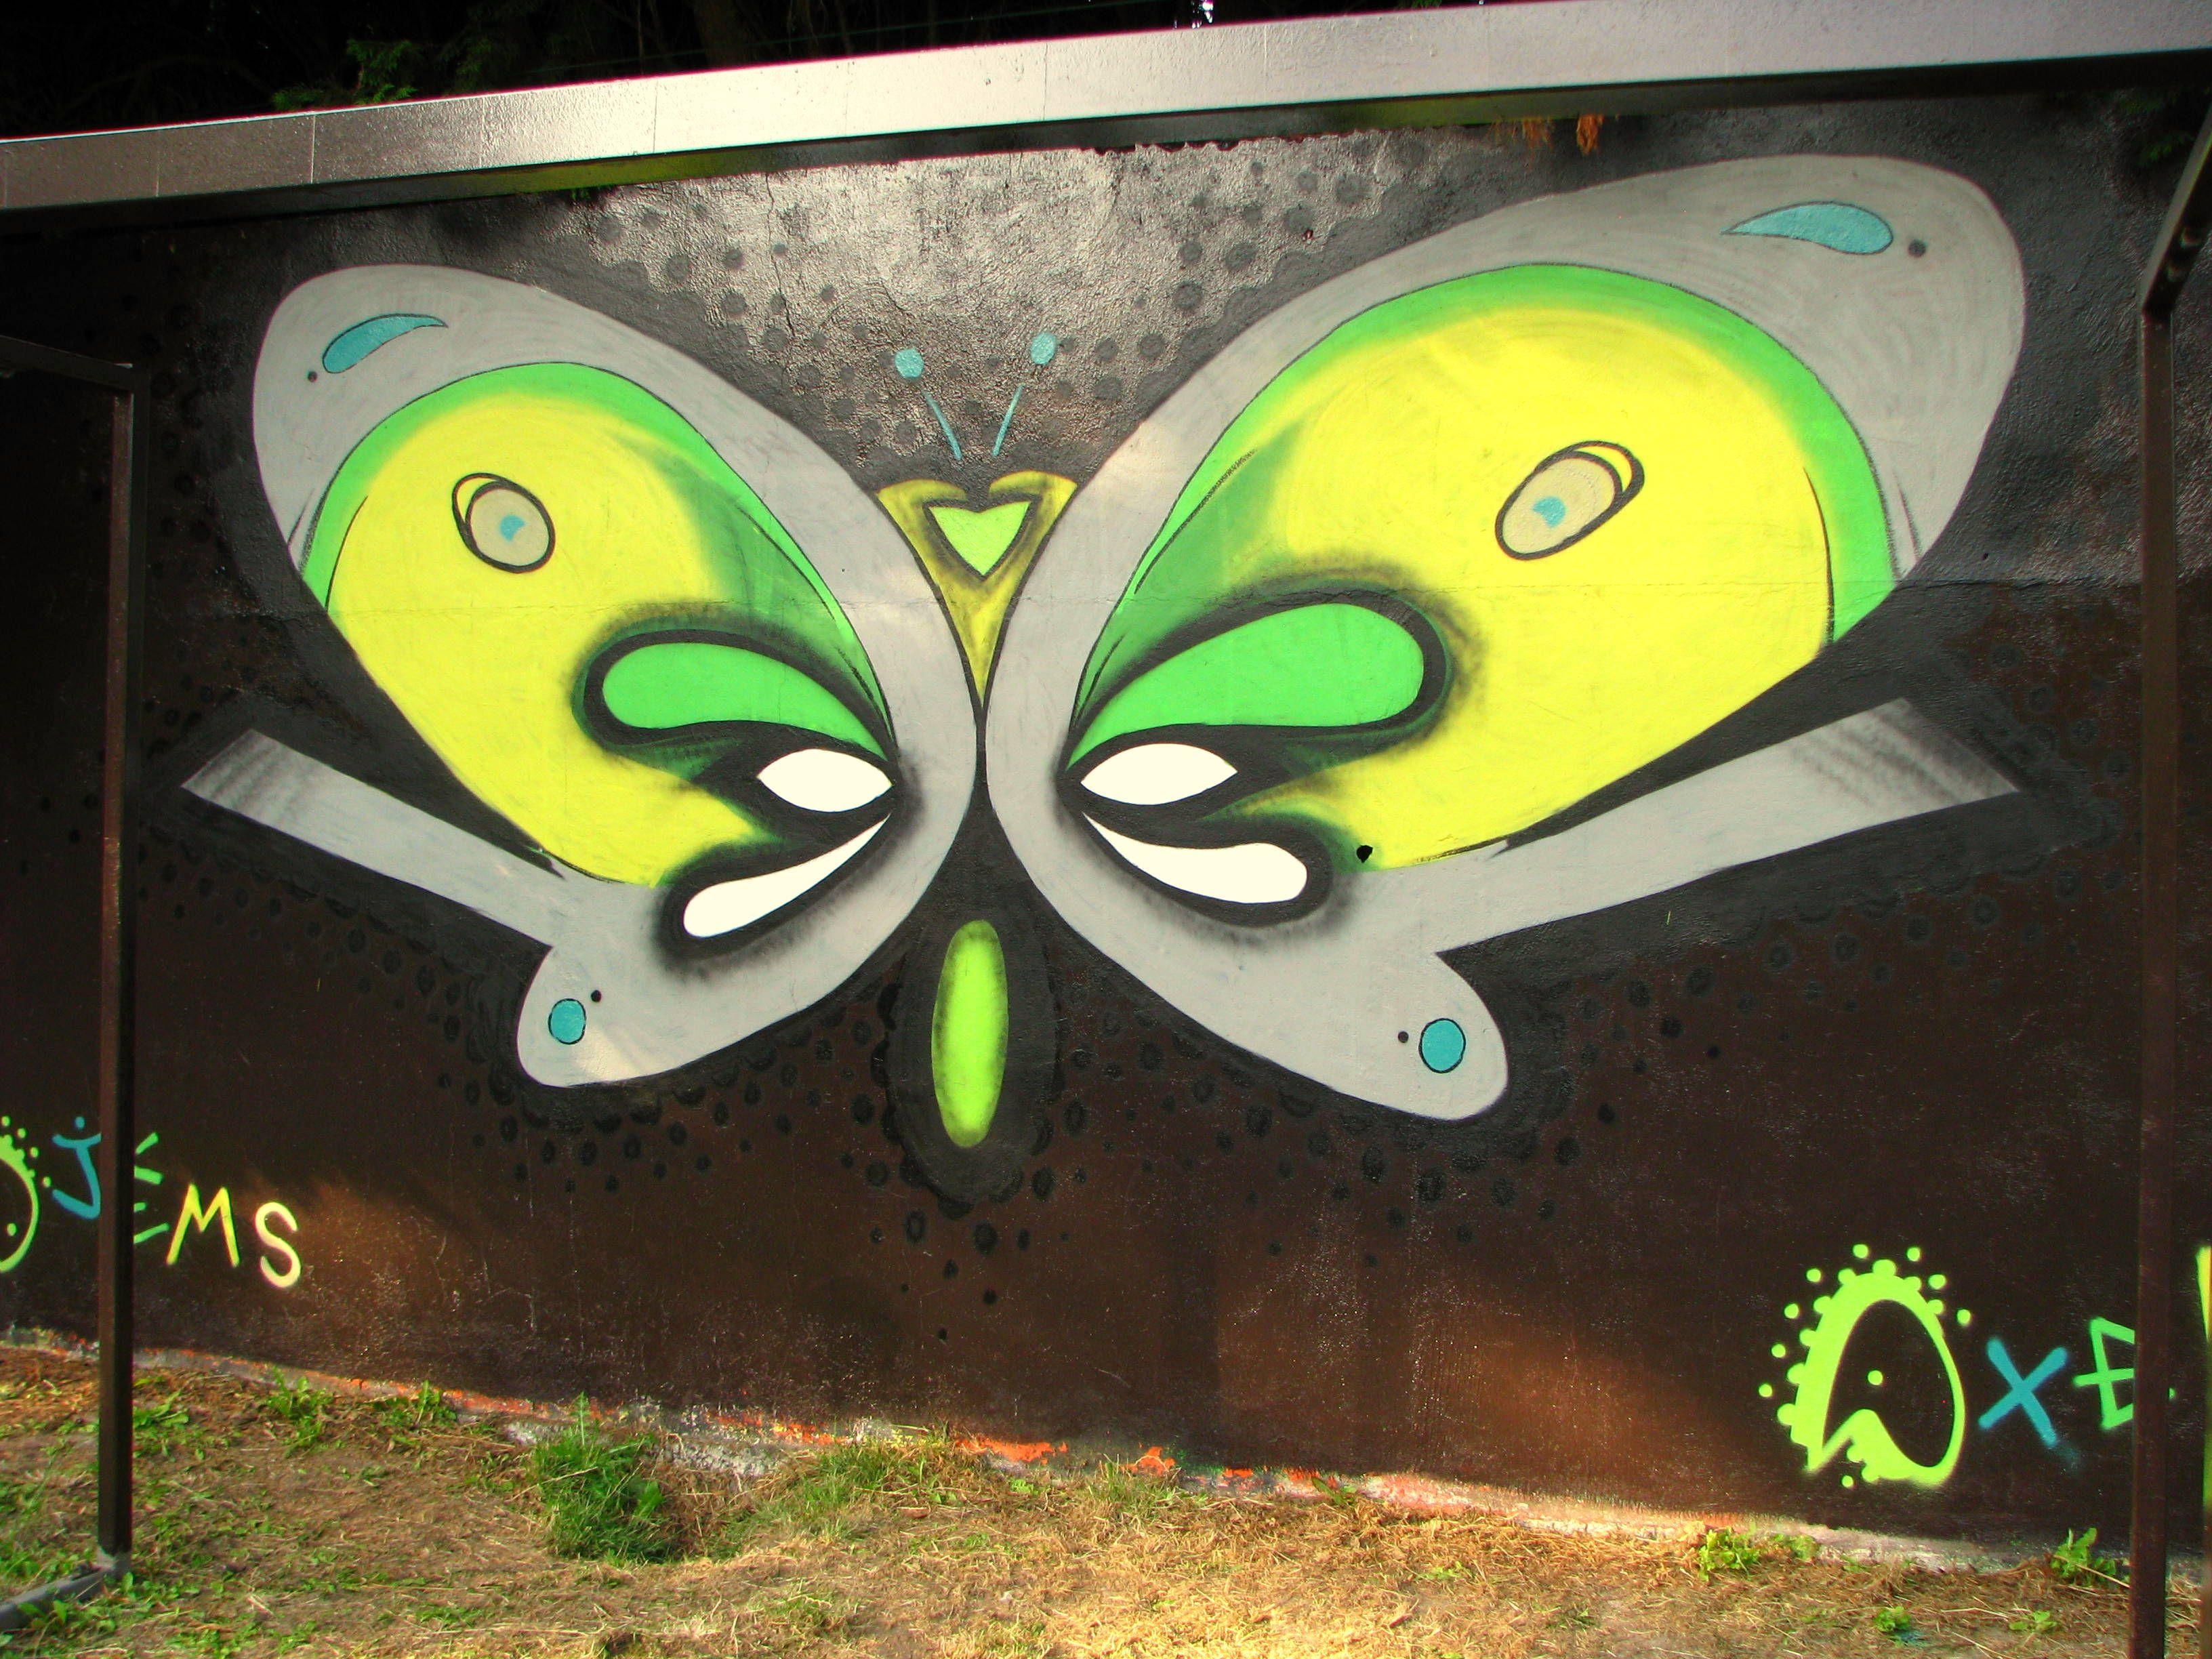 #james #axelska #graffiti #street_art #papillon #deco #wall #spray #marquette #mur_legal #fresque